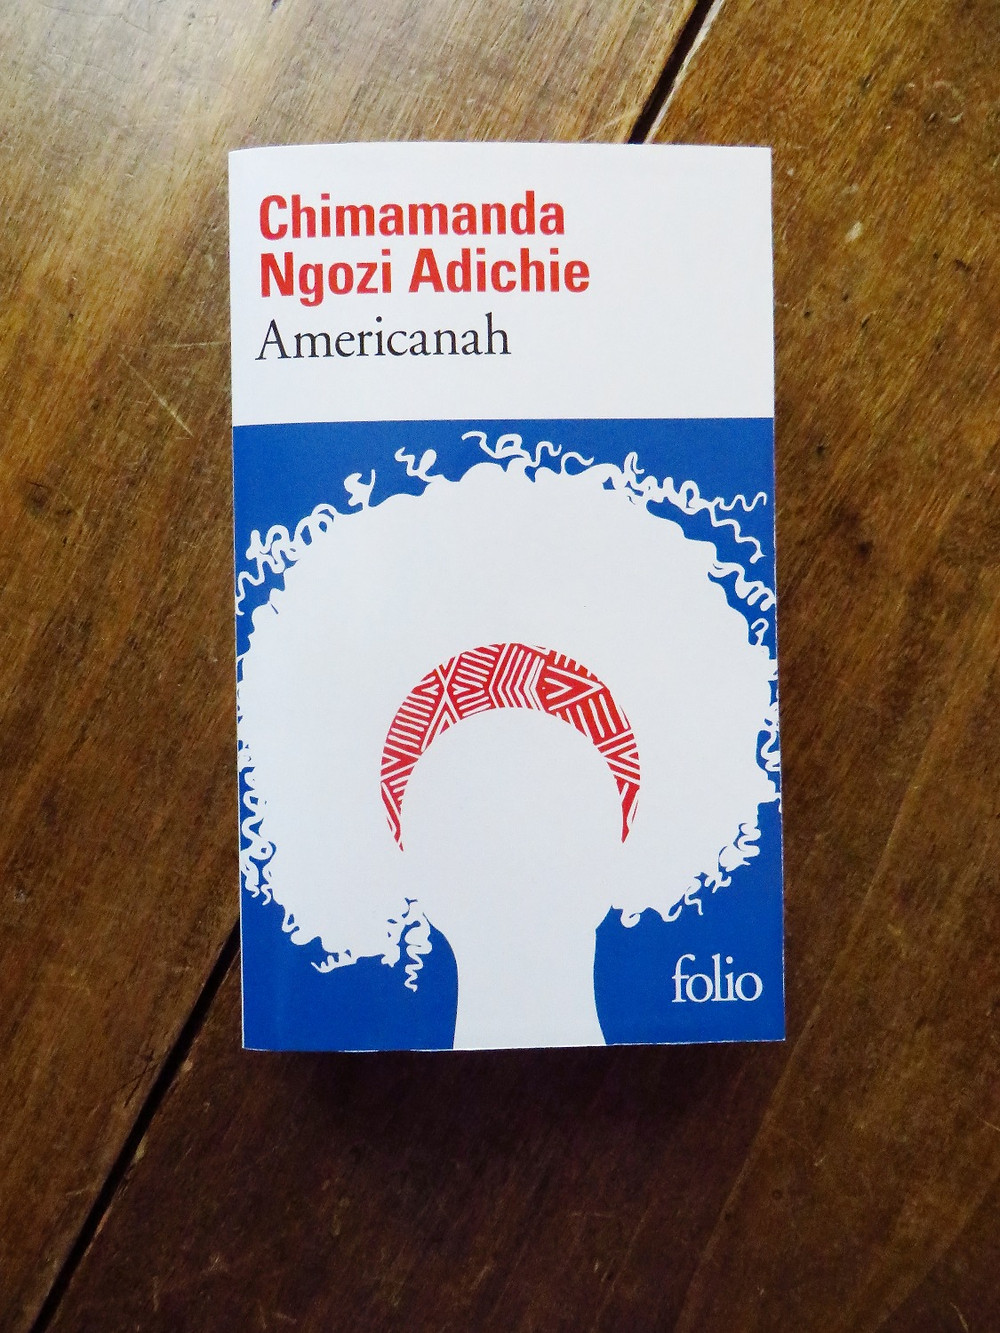 Photo du livre Americanah, de Chimamanda Ngozi Adichie (1)